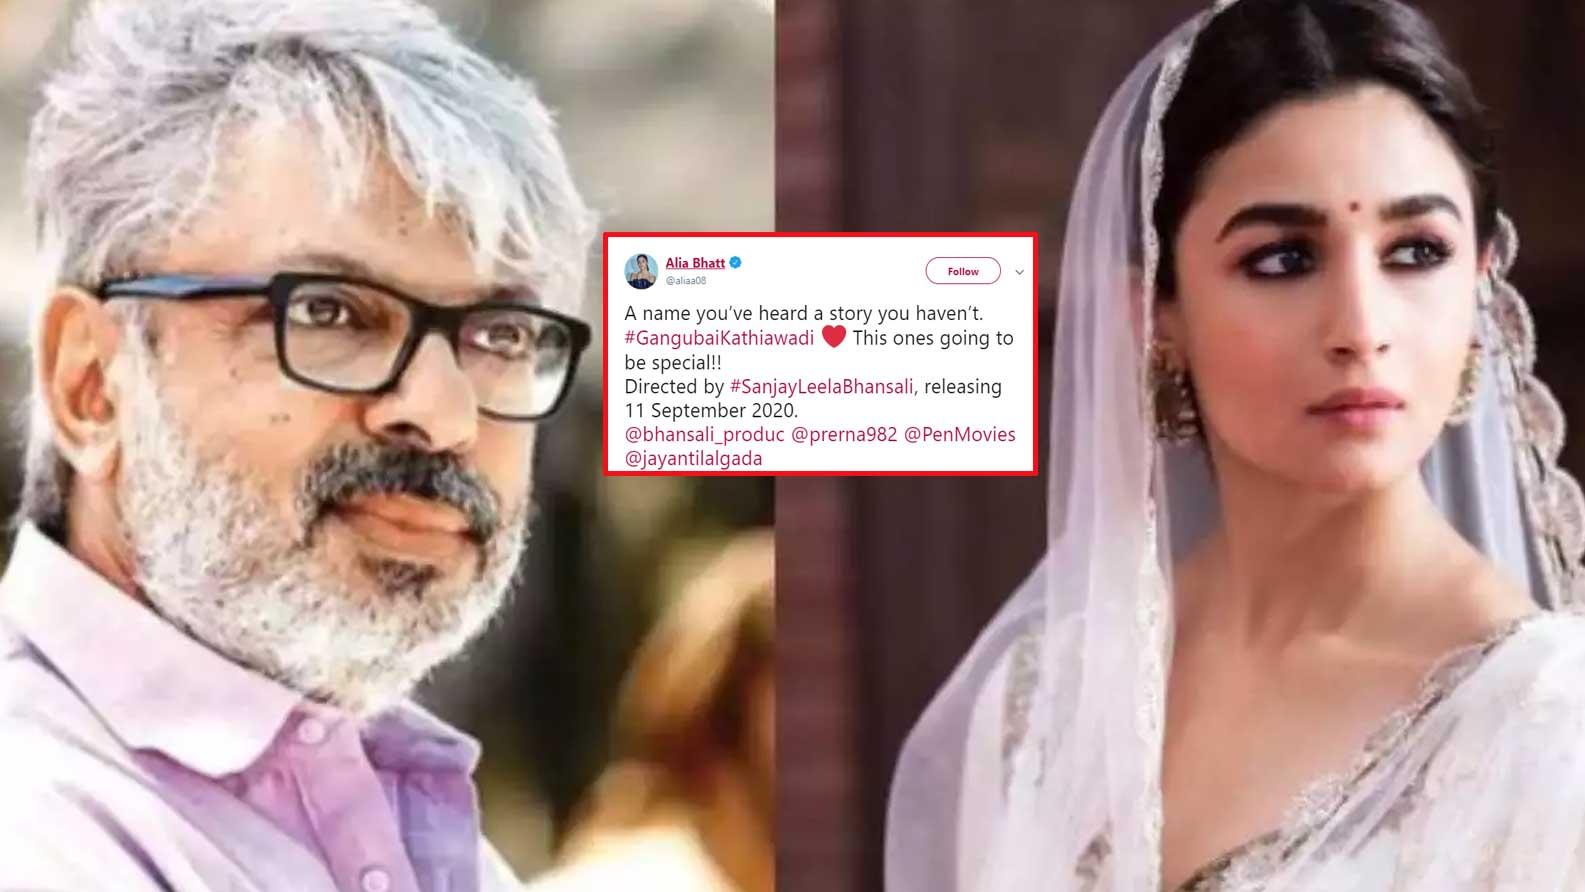 Confirmed! Alia Bhatt roped in for Sanjay Leela Bhansali's 'Gangubai Kathiawadi'